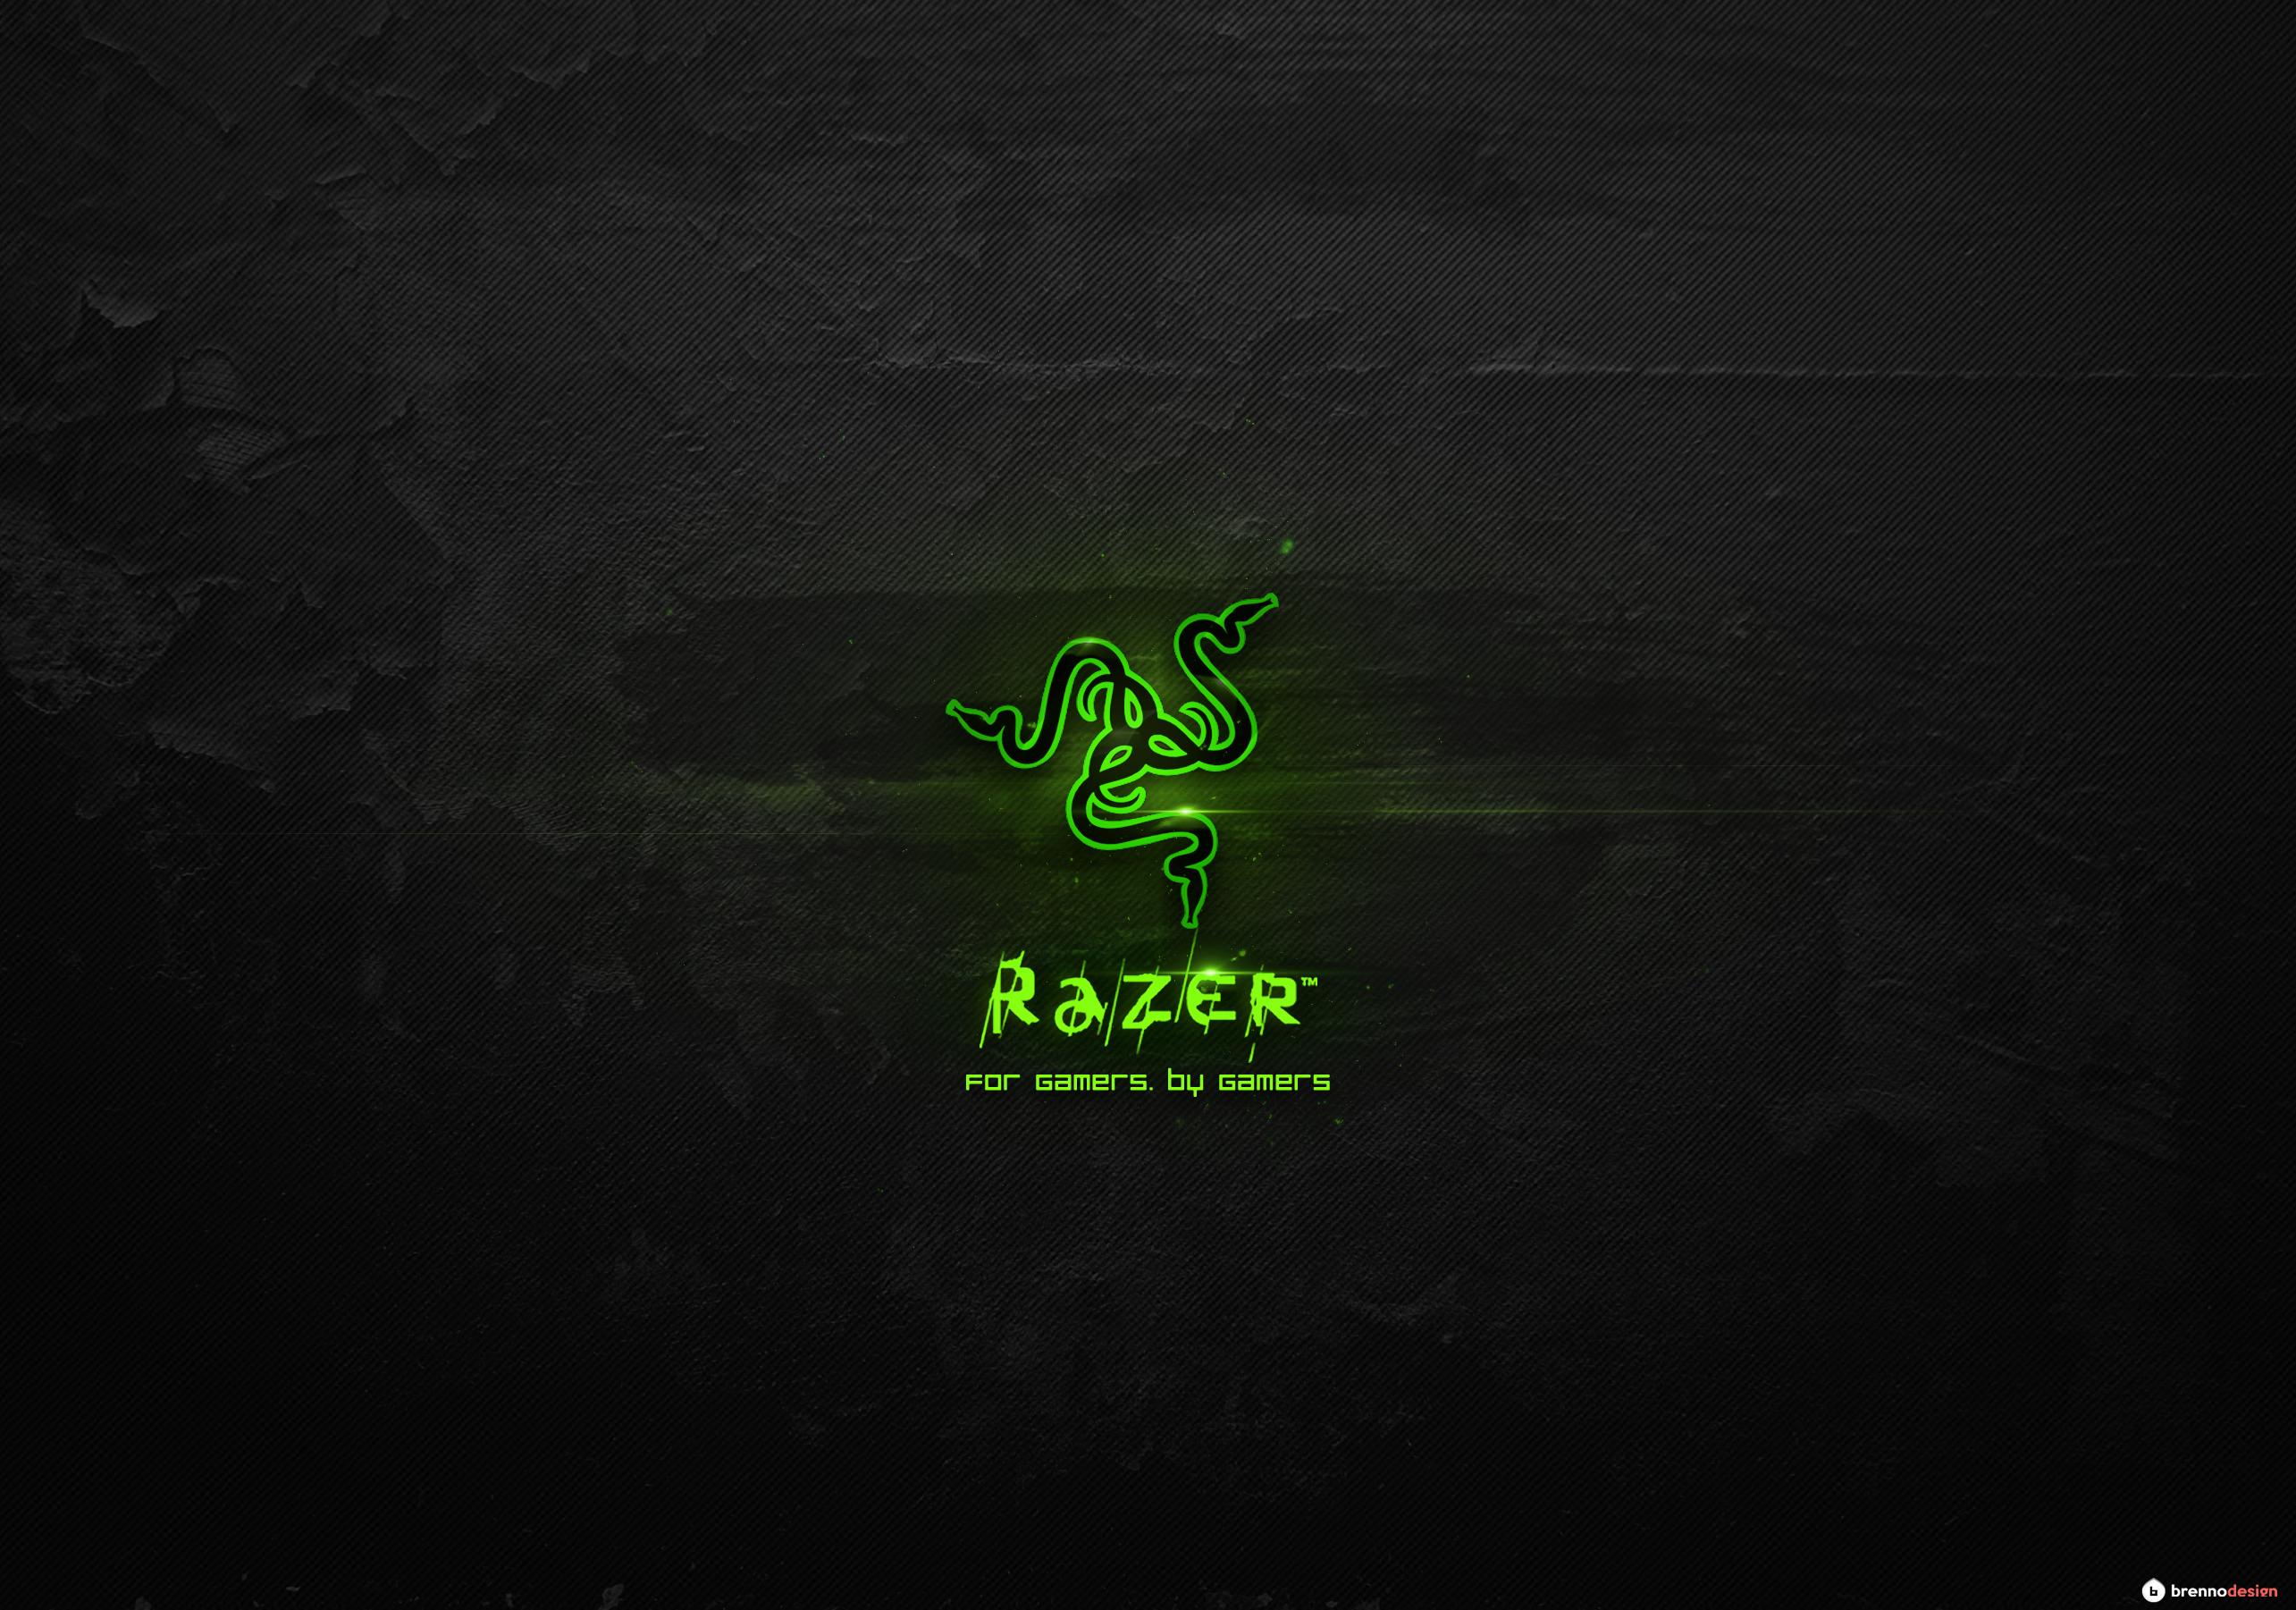 Preview Wallpaper Razer Logo Text 2560x1080 Pictures 2569x1801